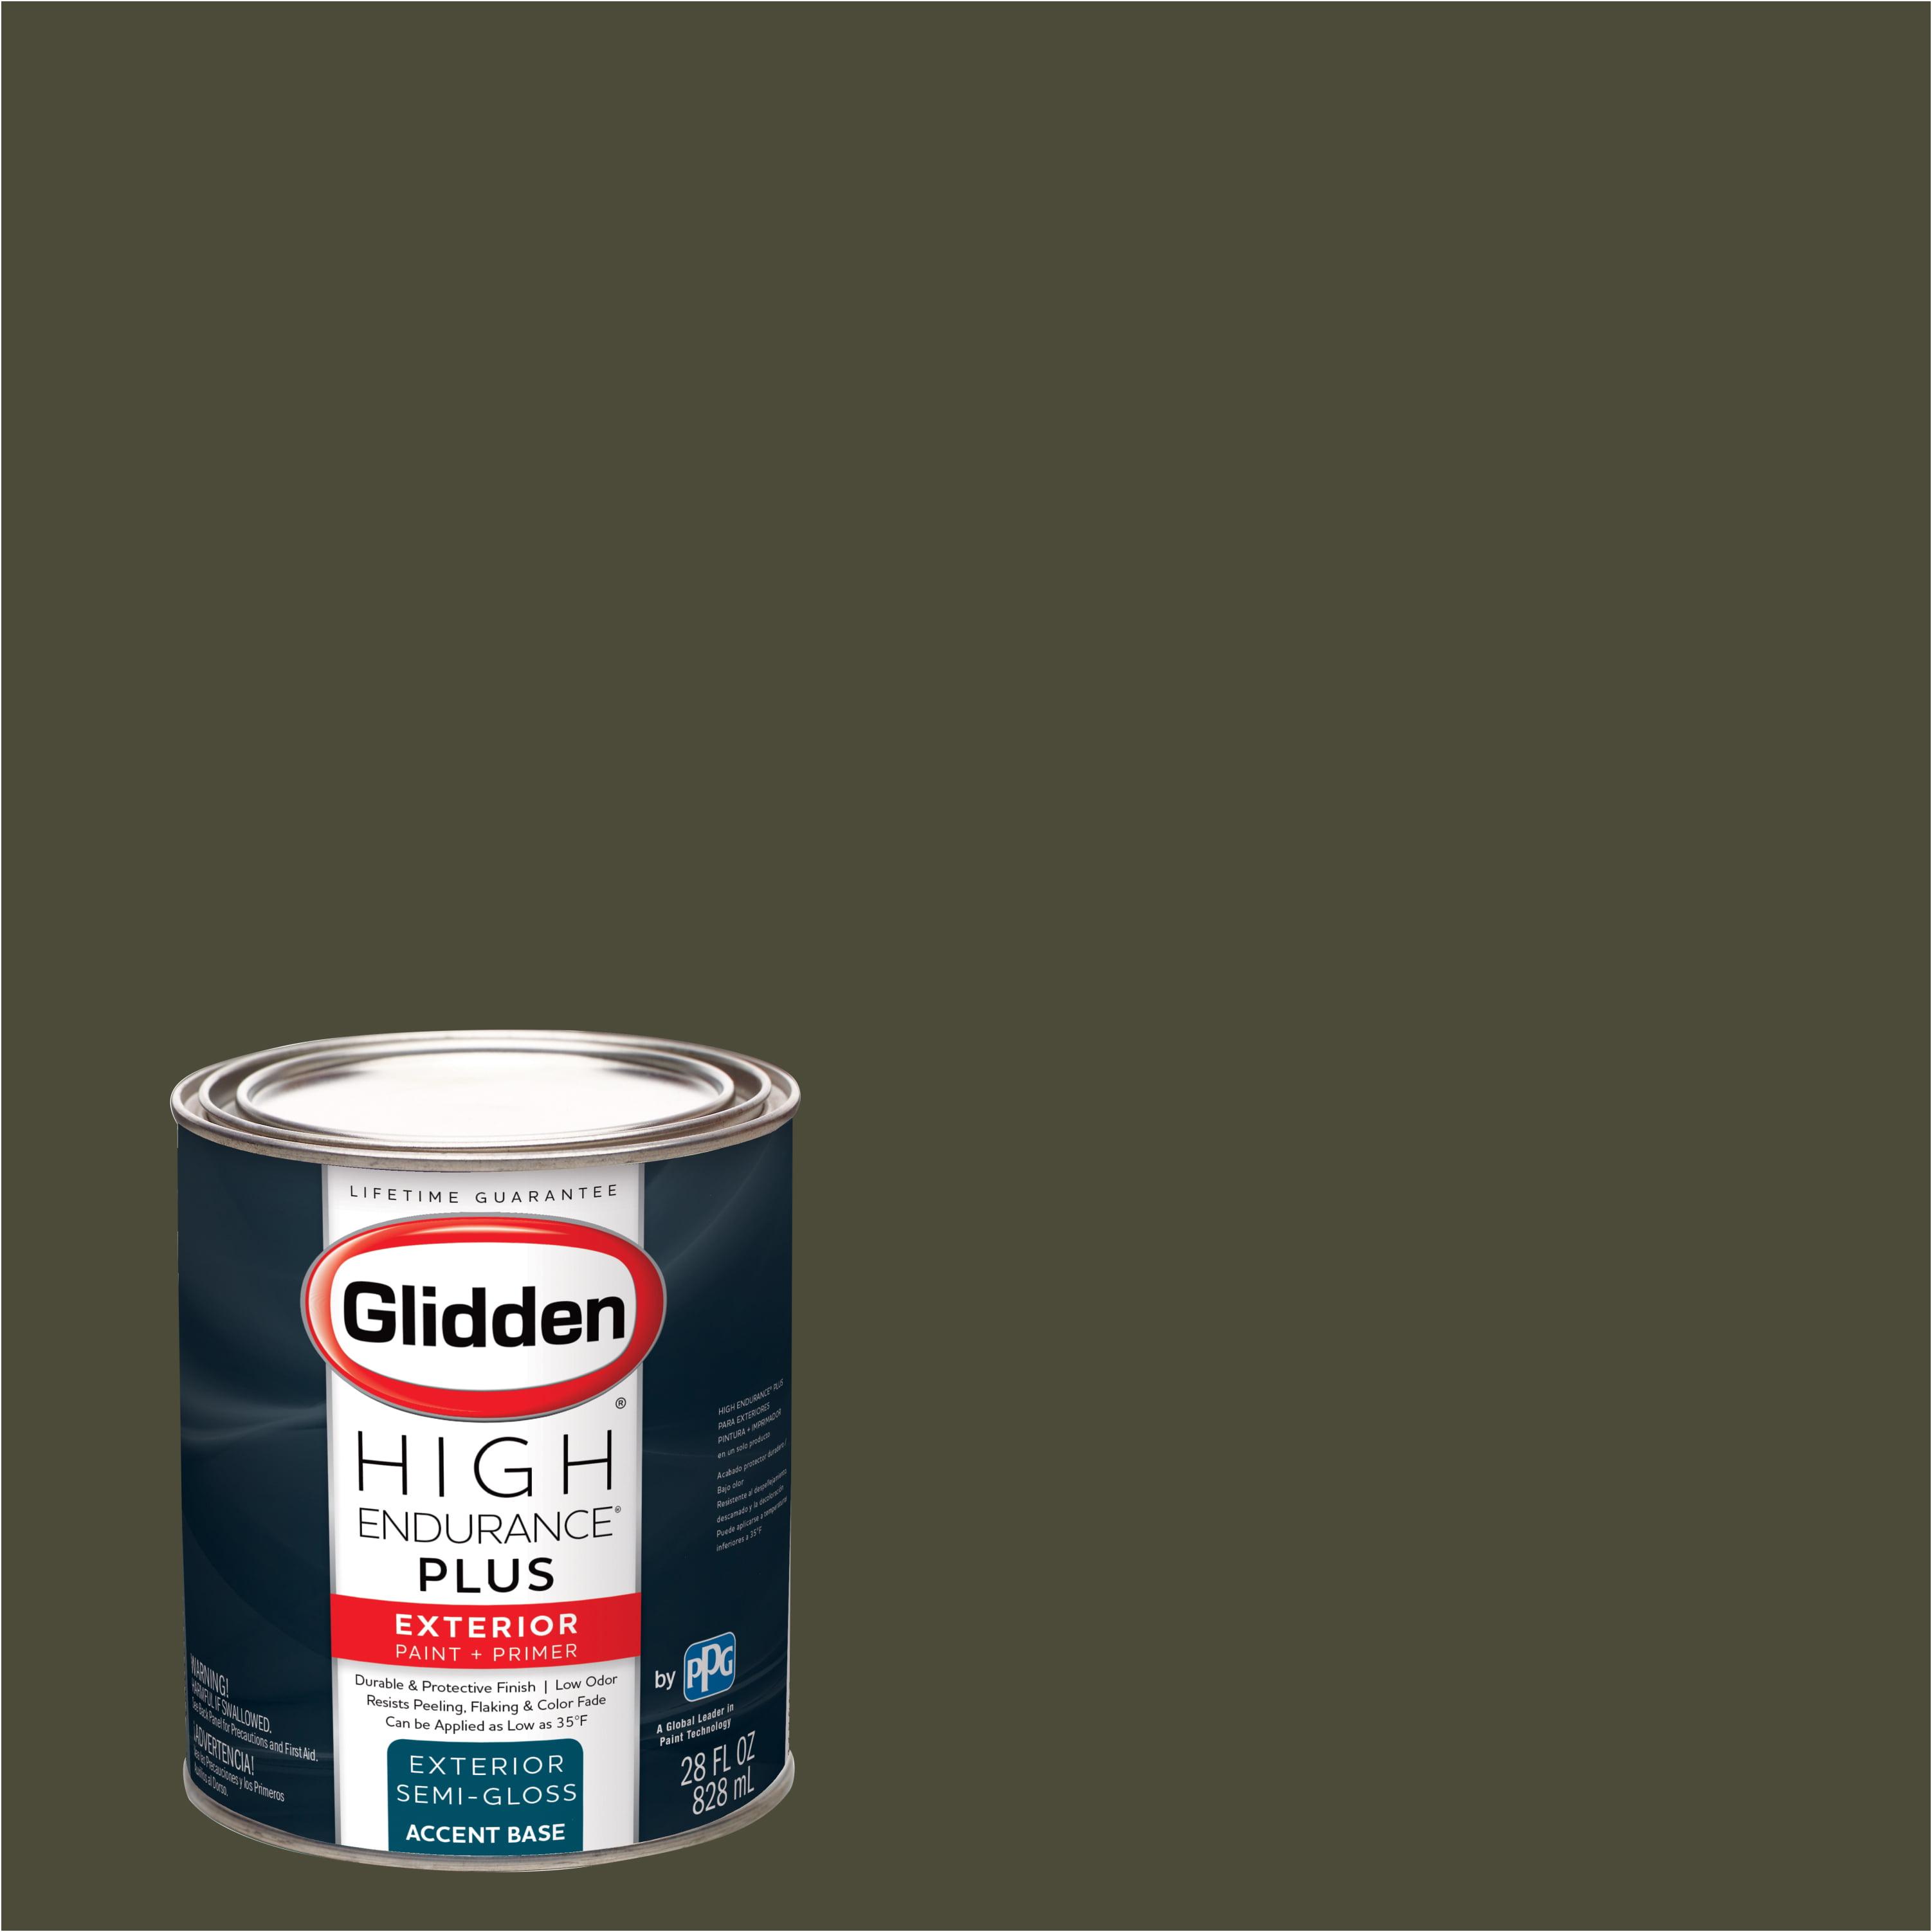 Glidden High Endurance Plus Exterior Paint and Primer, Olive Black, #50YY 09/101